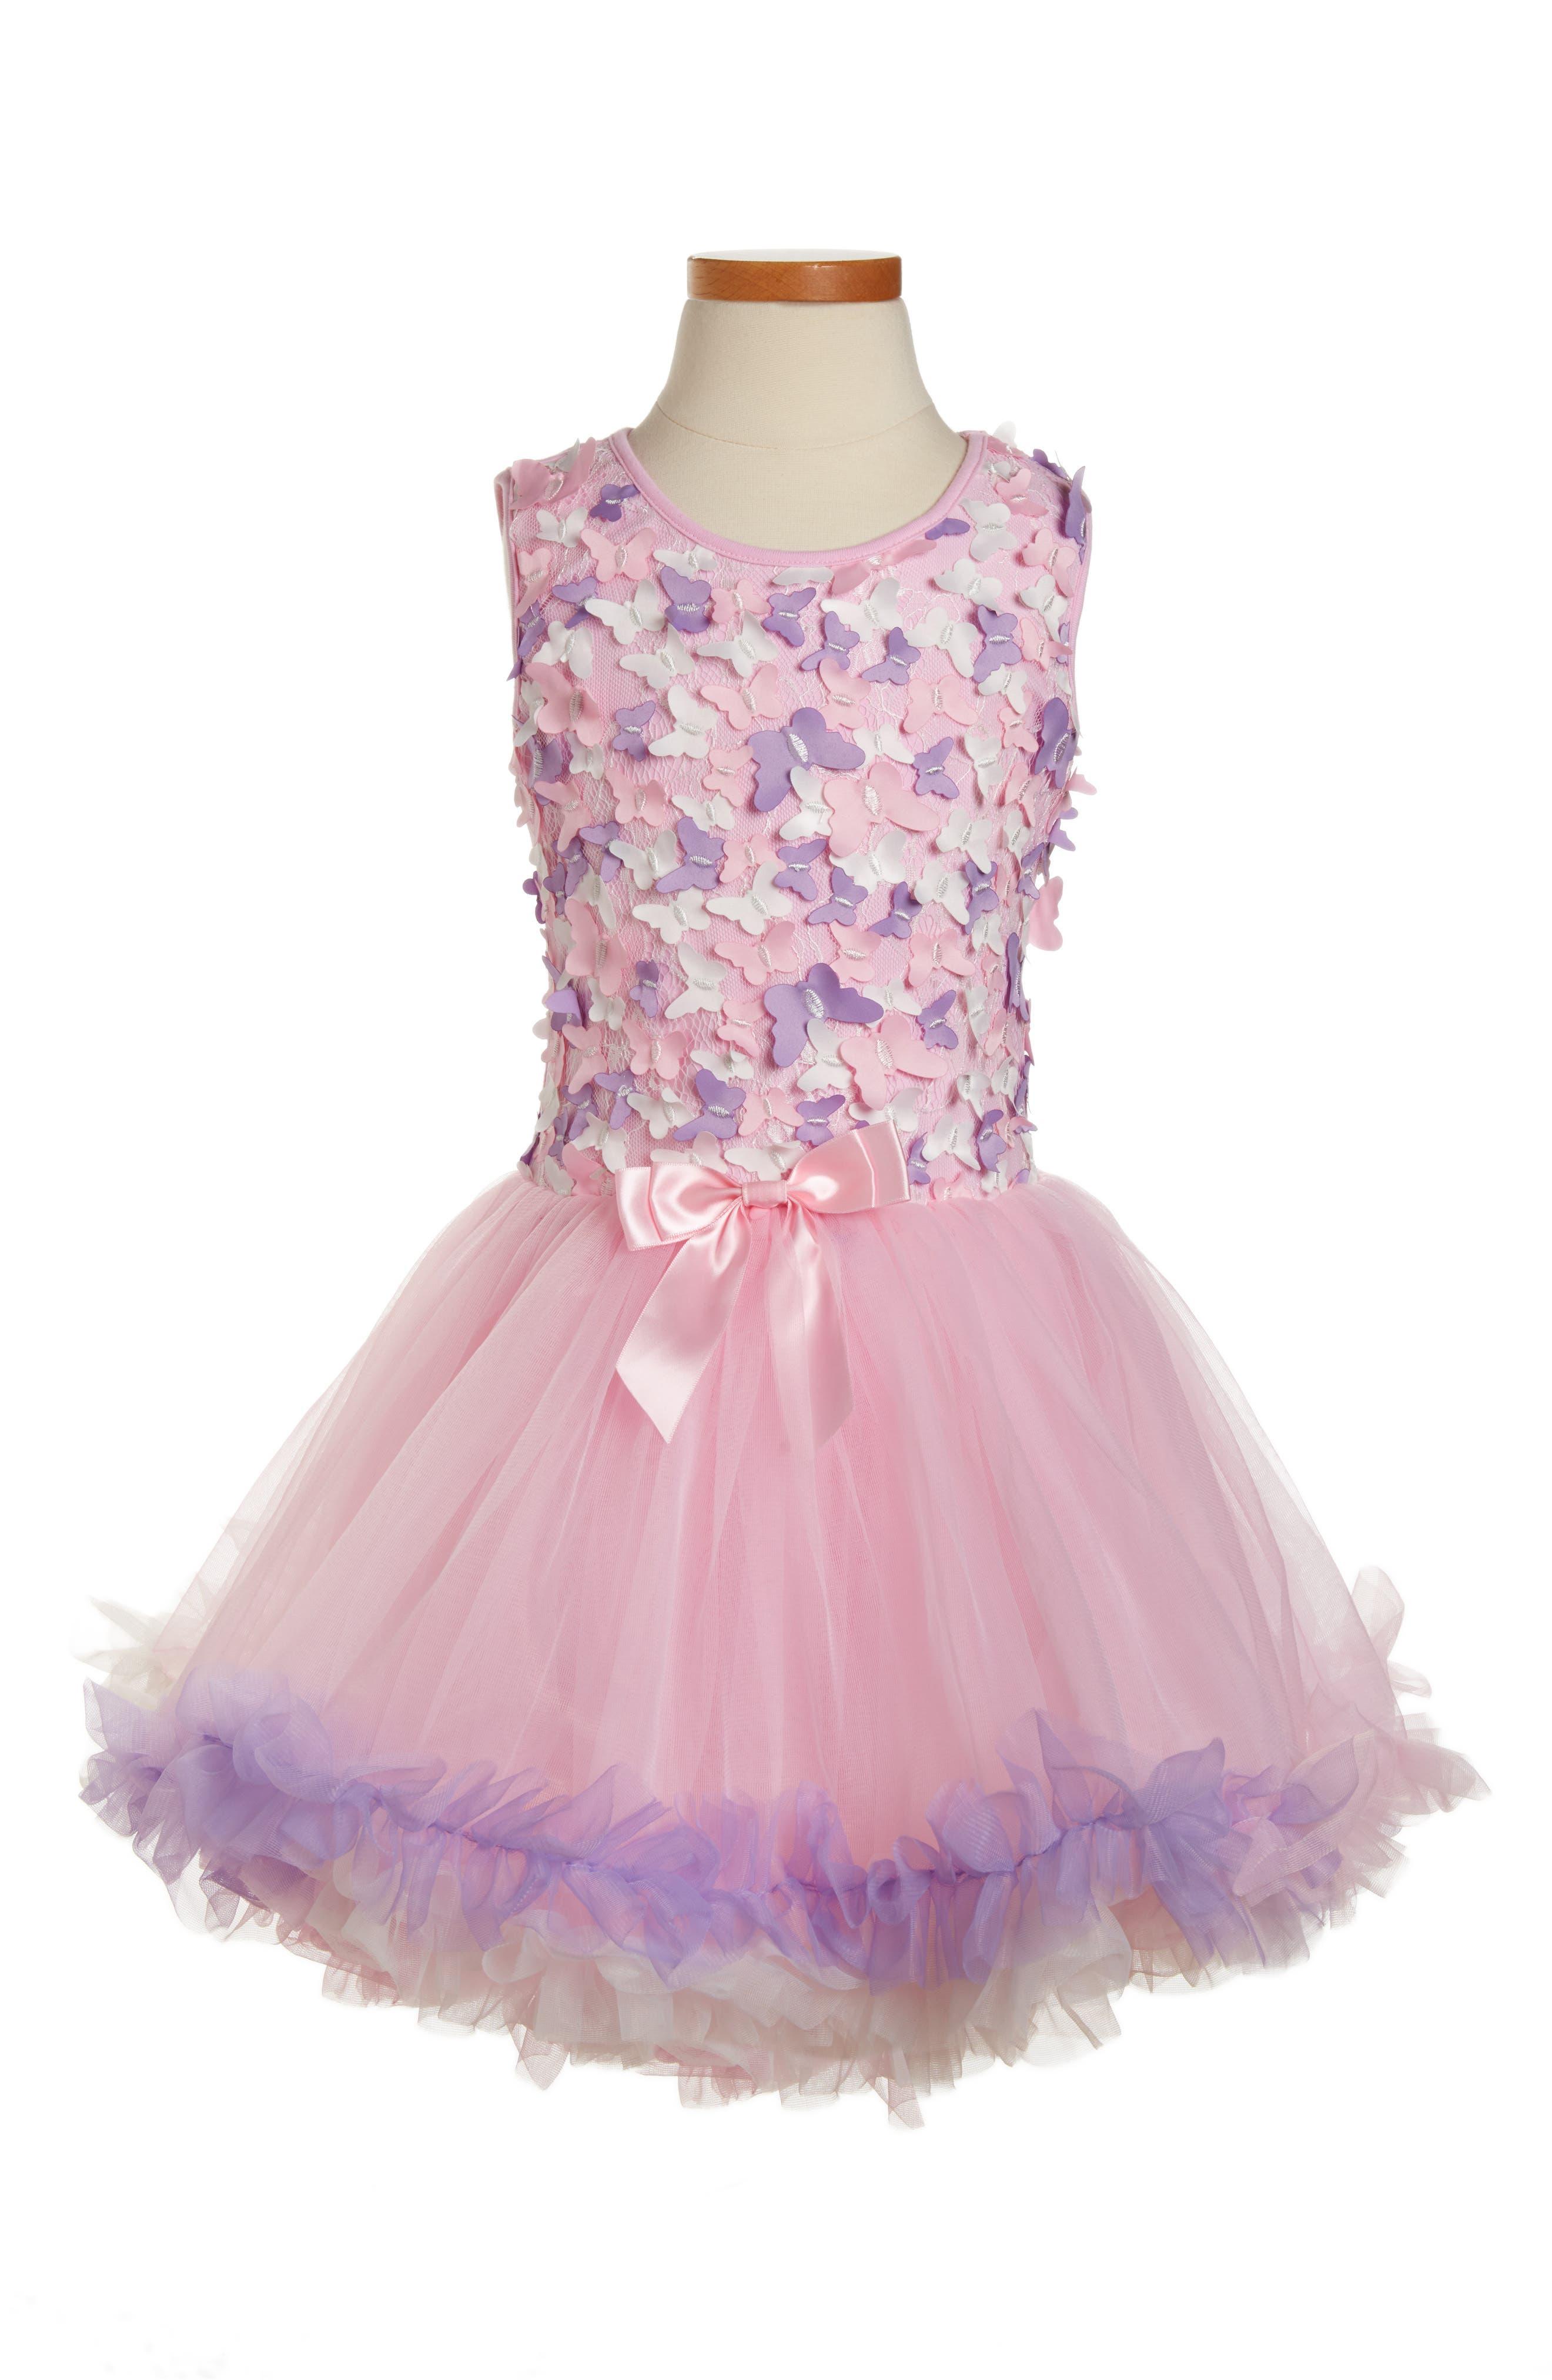 Butterfly Sleeveless Dress,                         Main,                         color, Pink/ Purple Multi